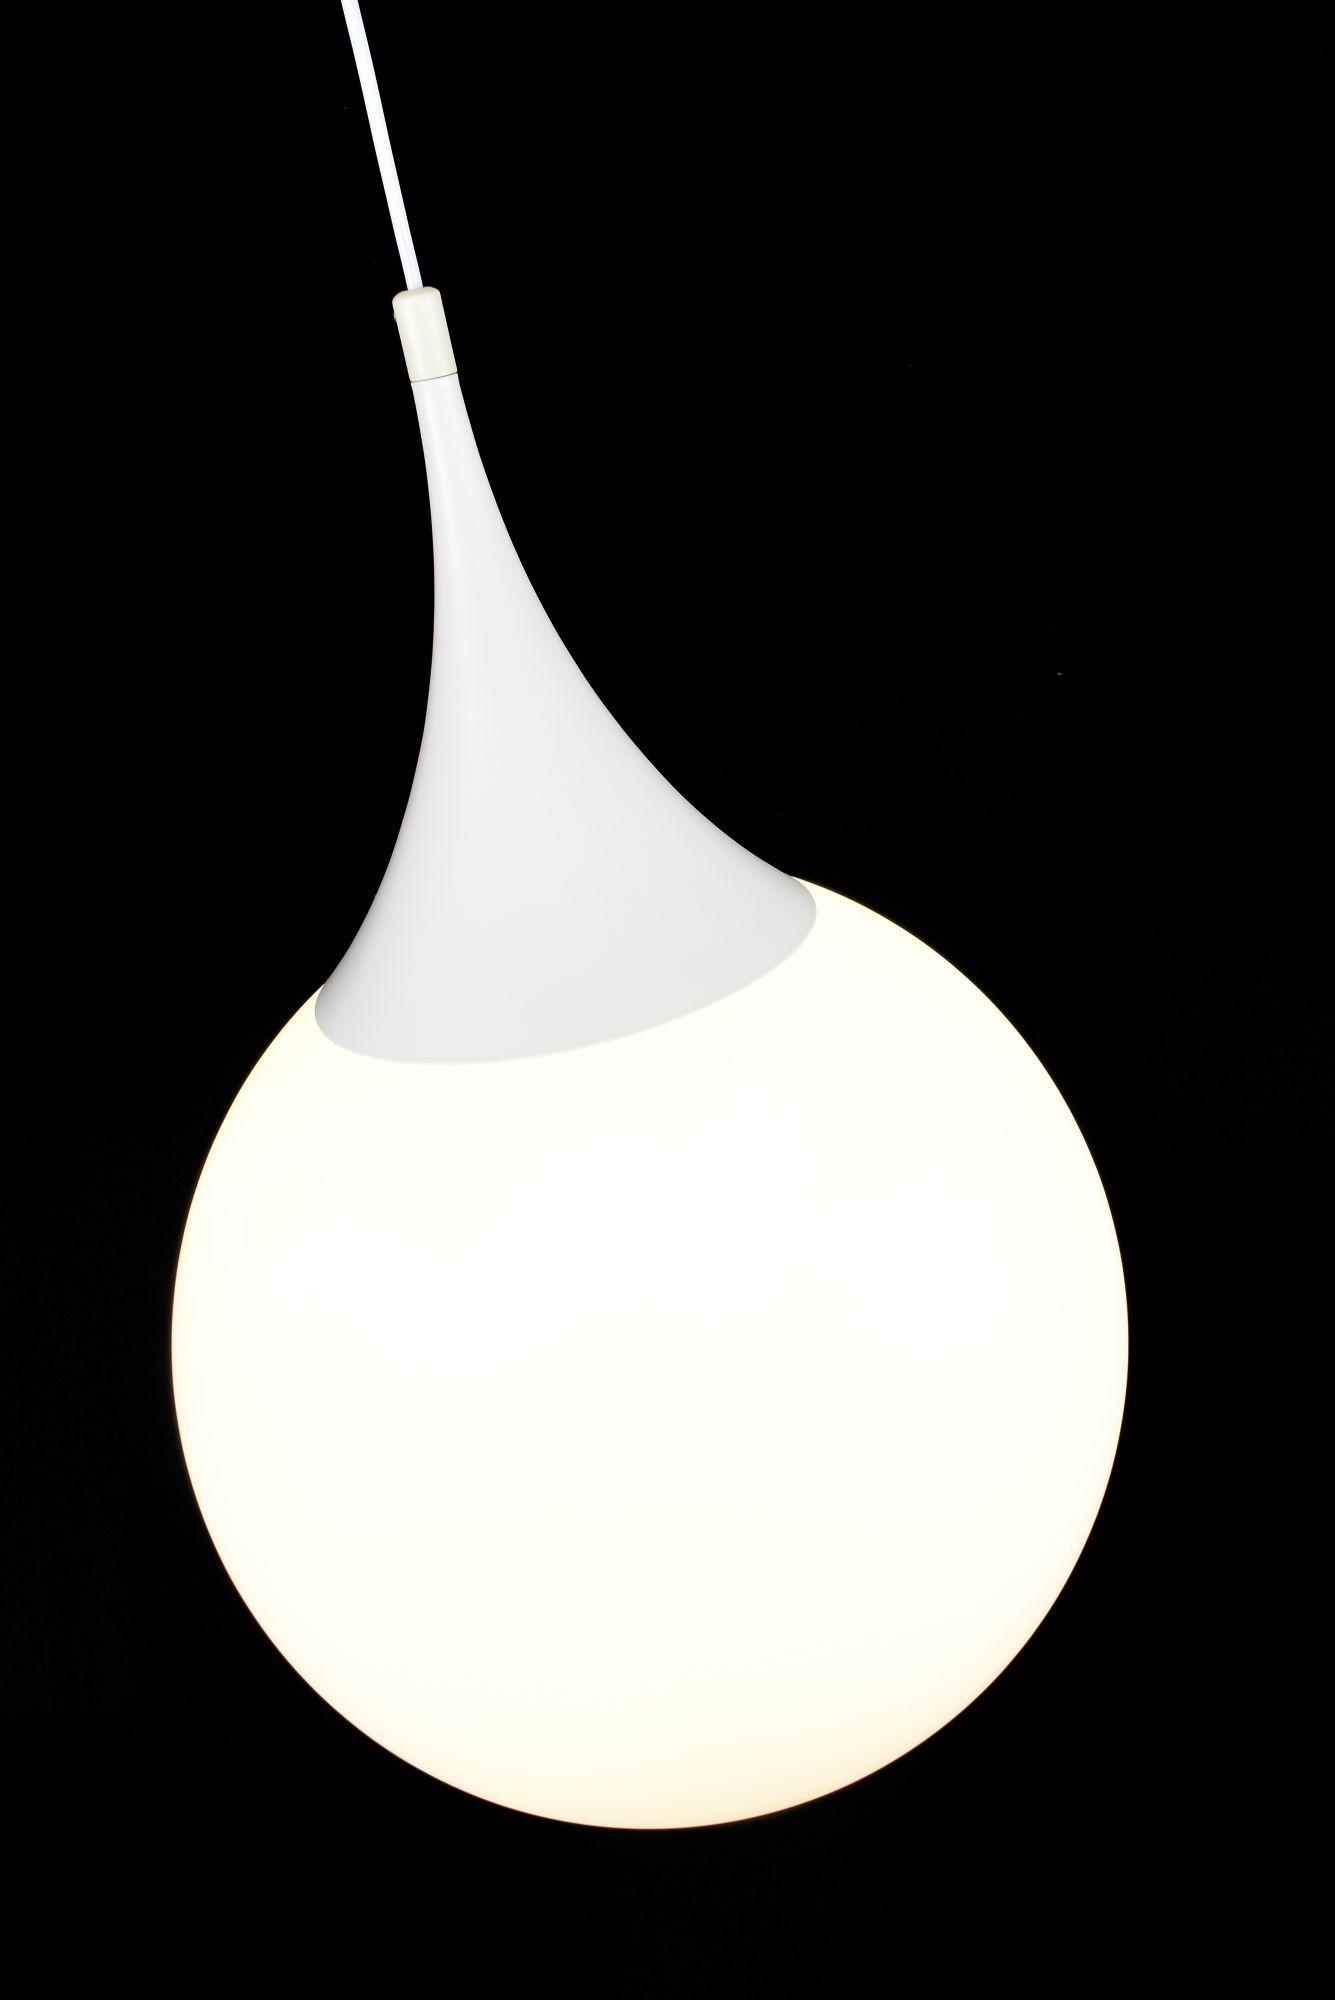 Подвесной светильник Maytoni Dewdrop P225-PL-400-N (mod225-40-n), 1xE27x8W, белый, металл, стекло - фото 6